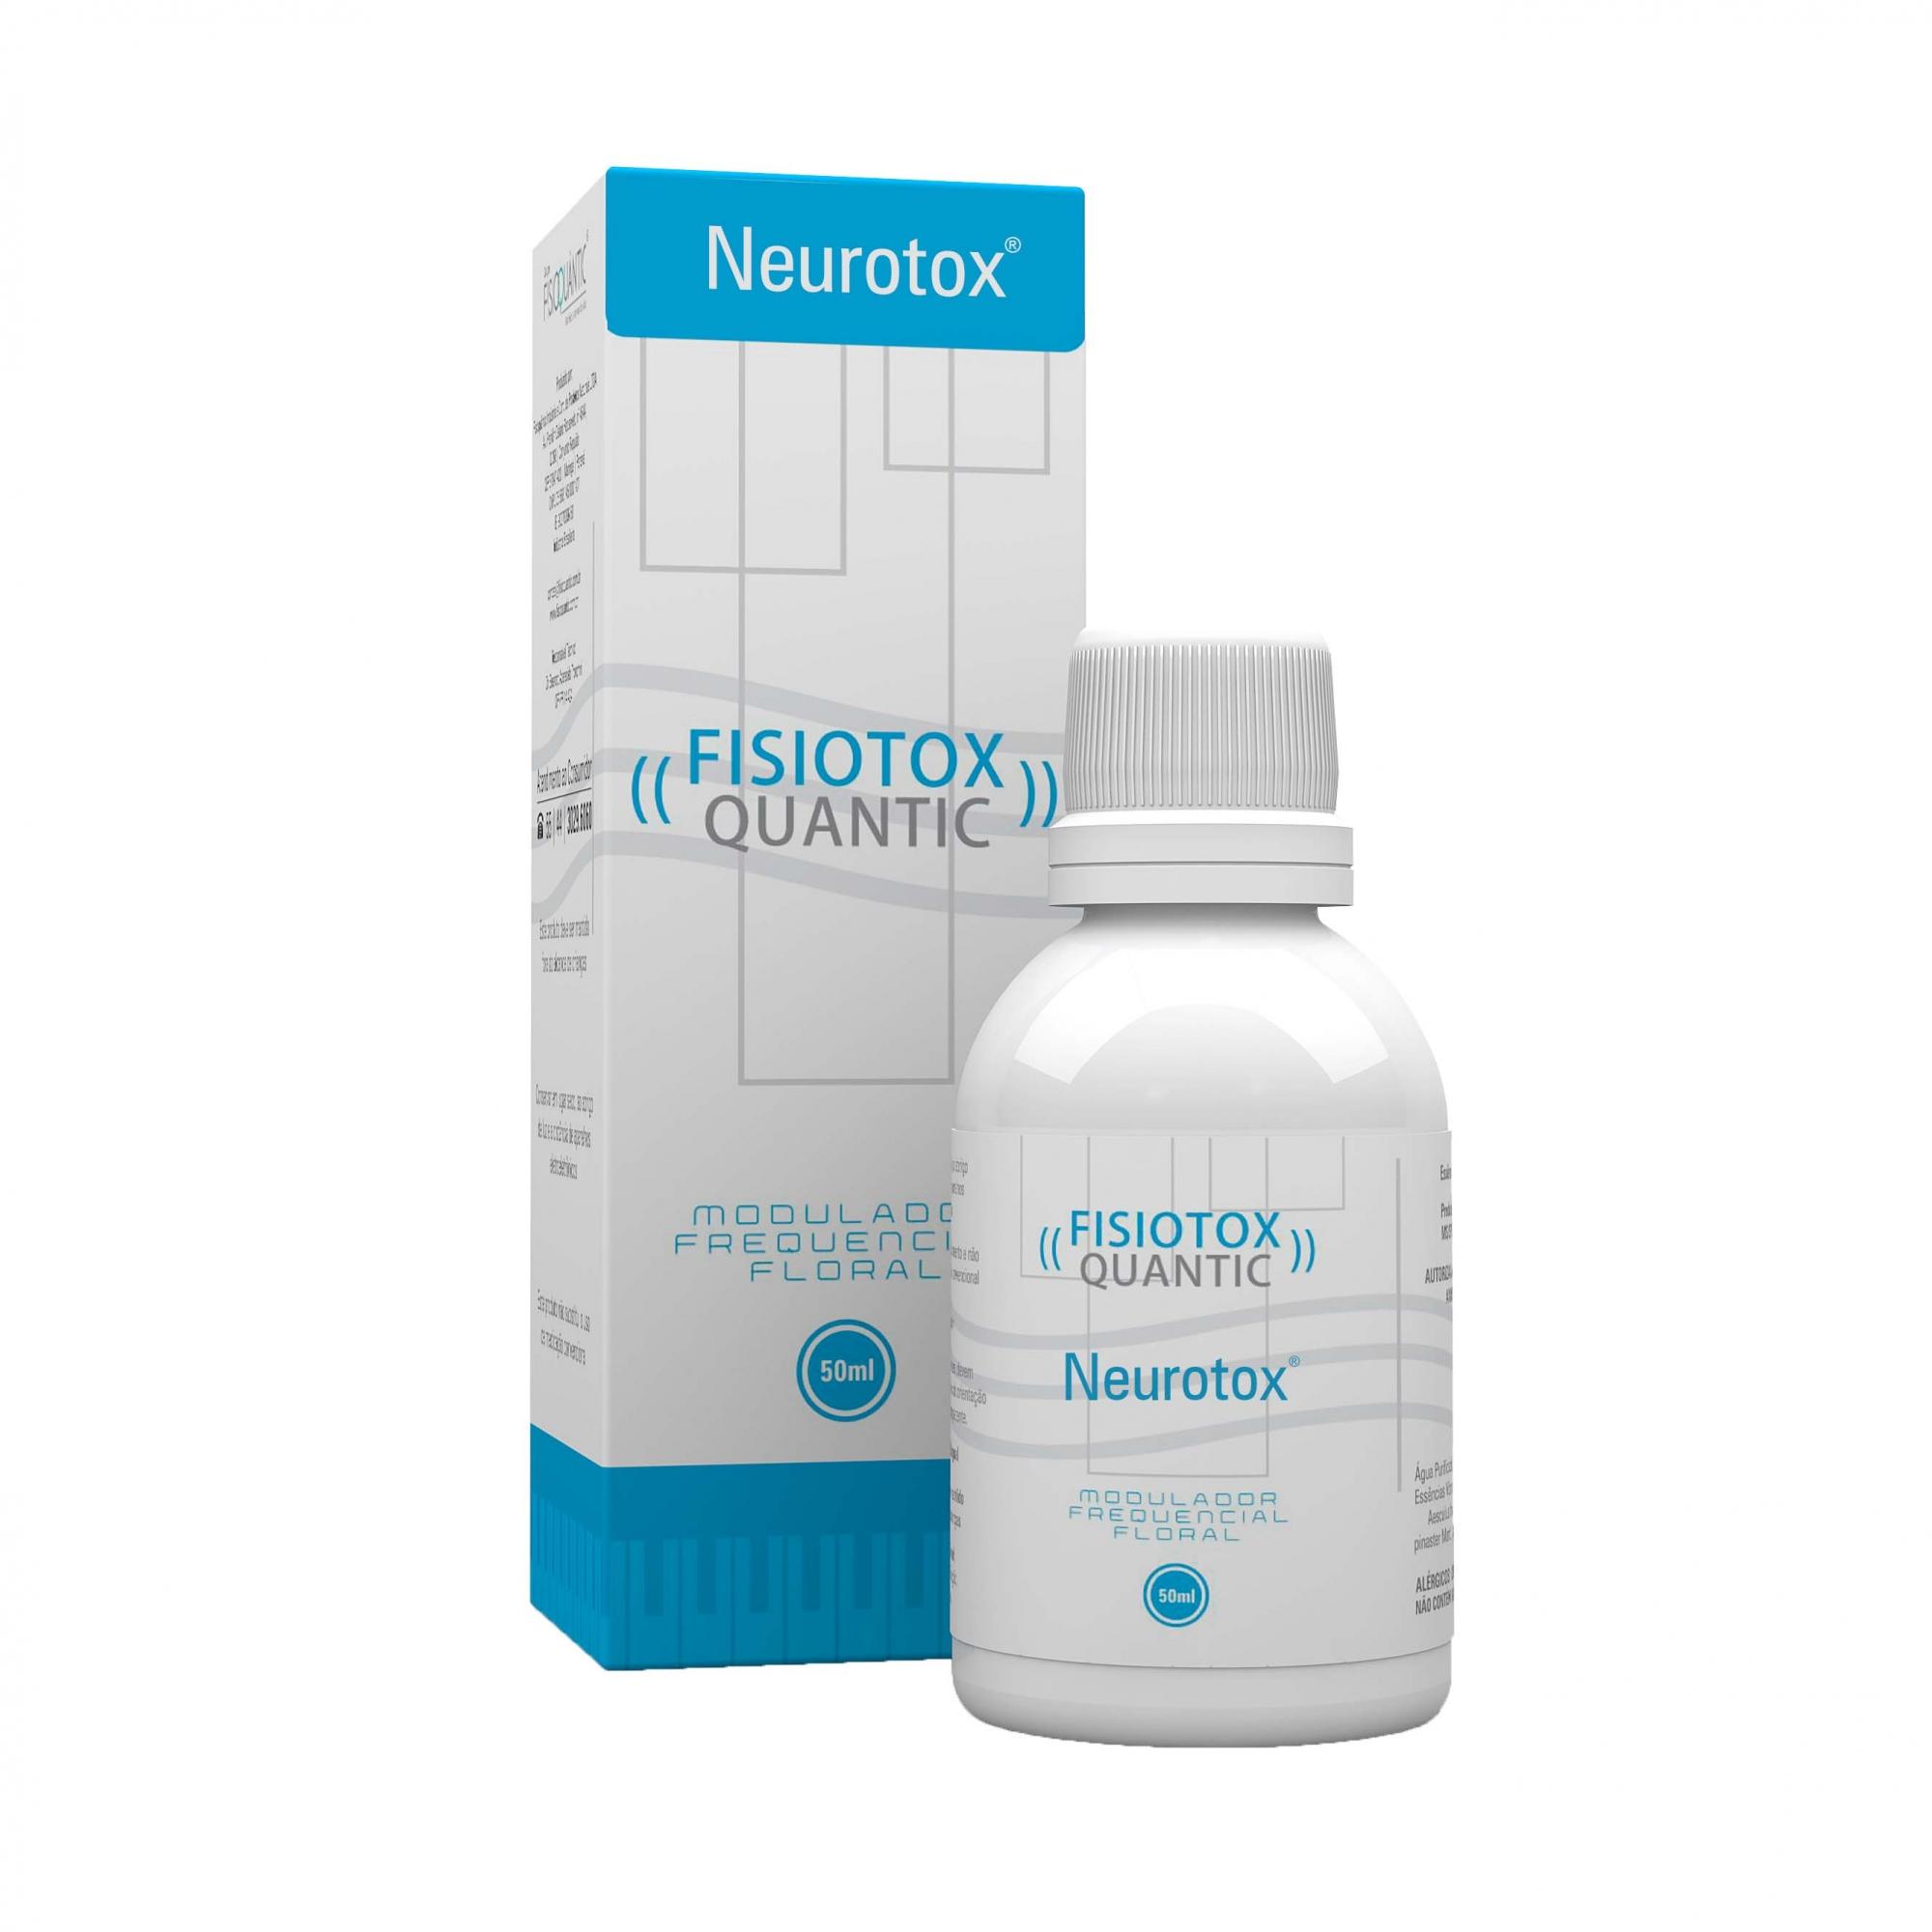 FisiotoxQuantic Neurotox 50ml Fisioquantic